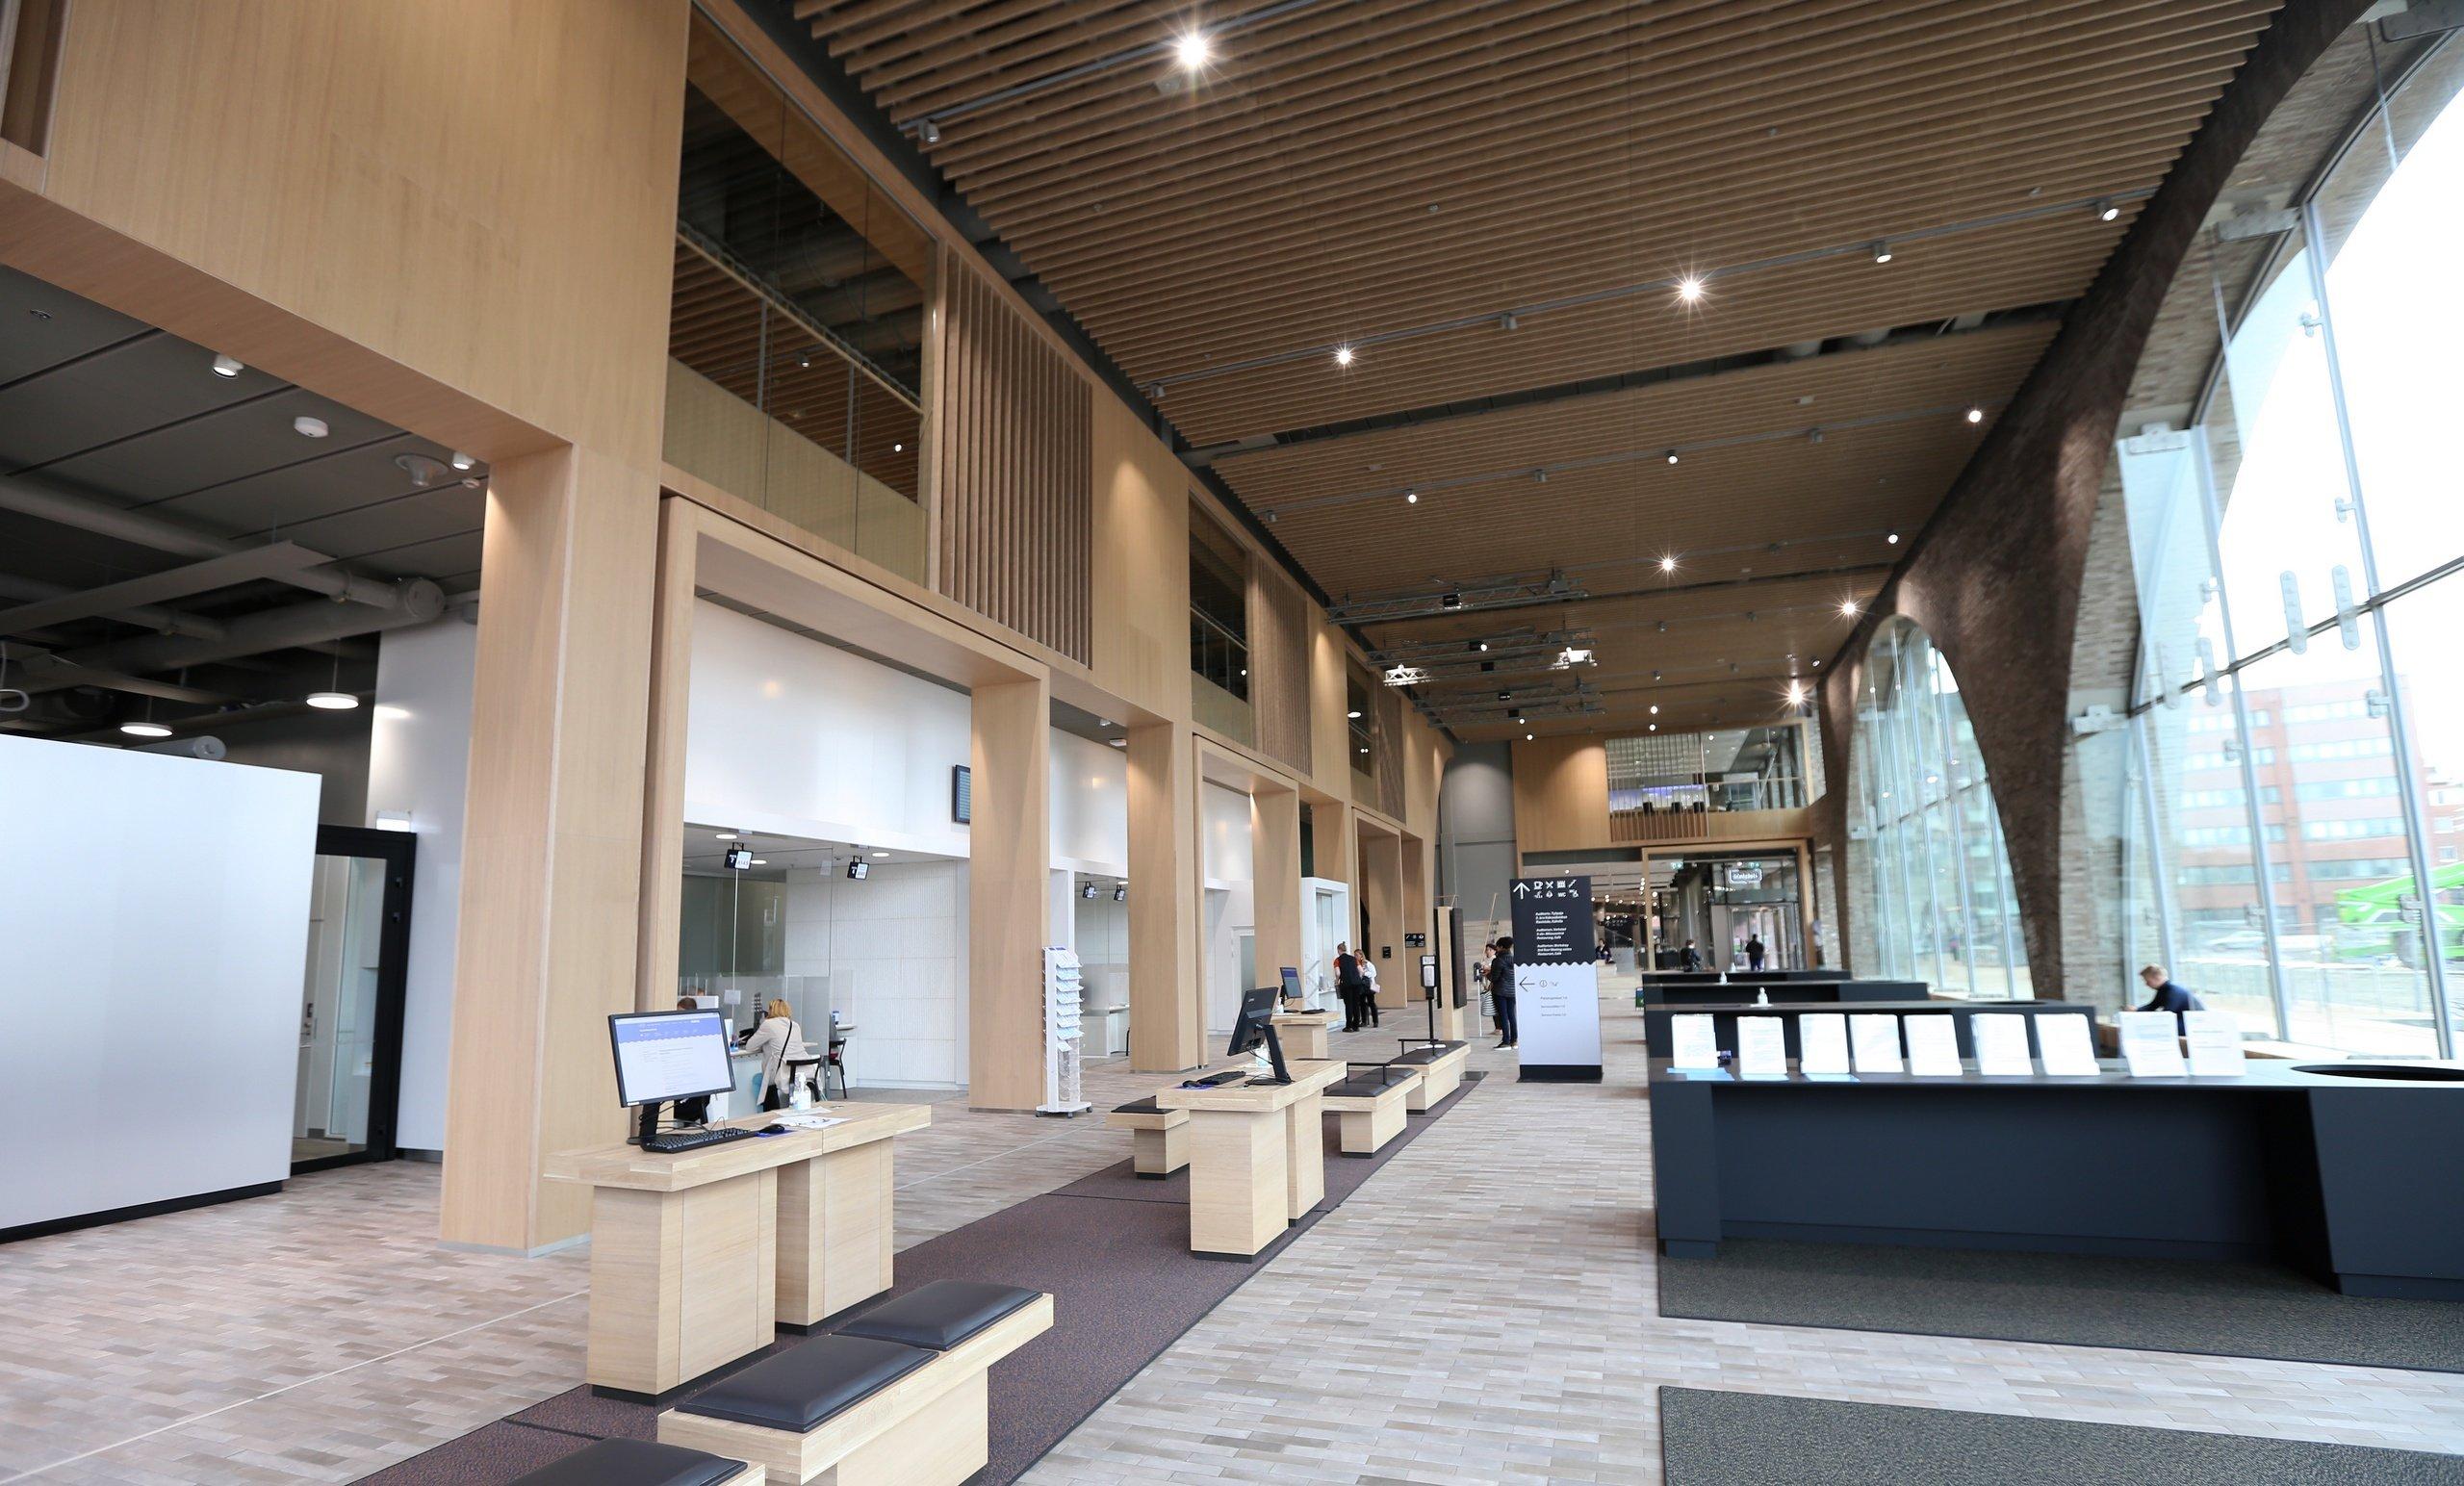 kaupunkiympäristötalo-aula